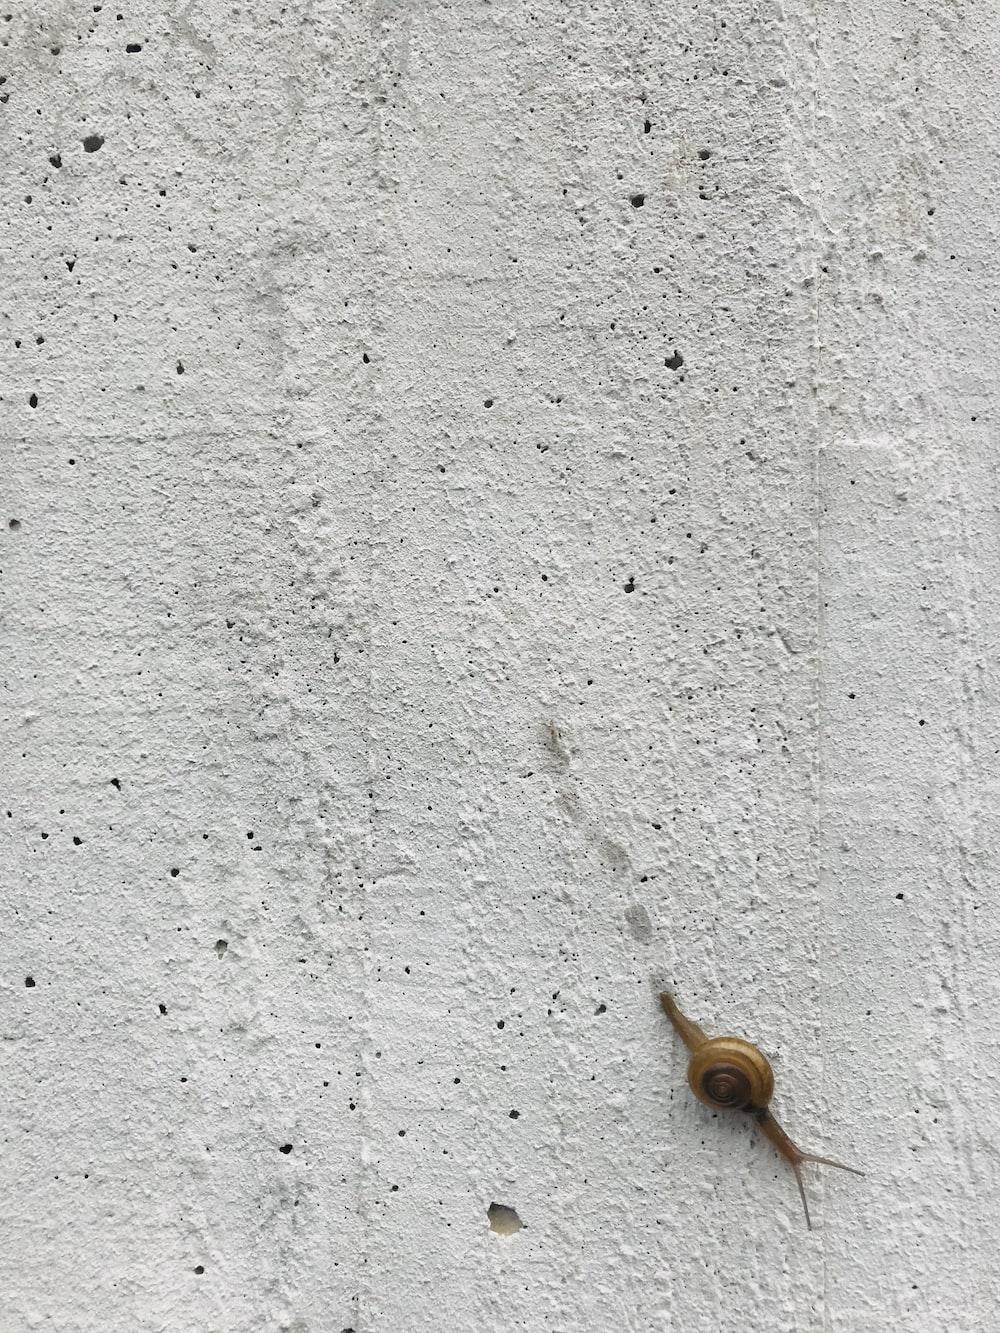 brow snail on gray wall